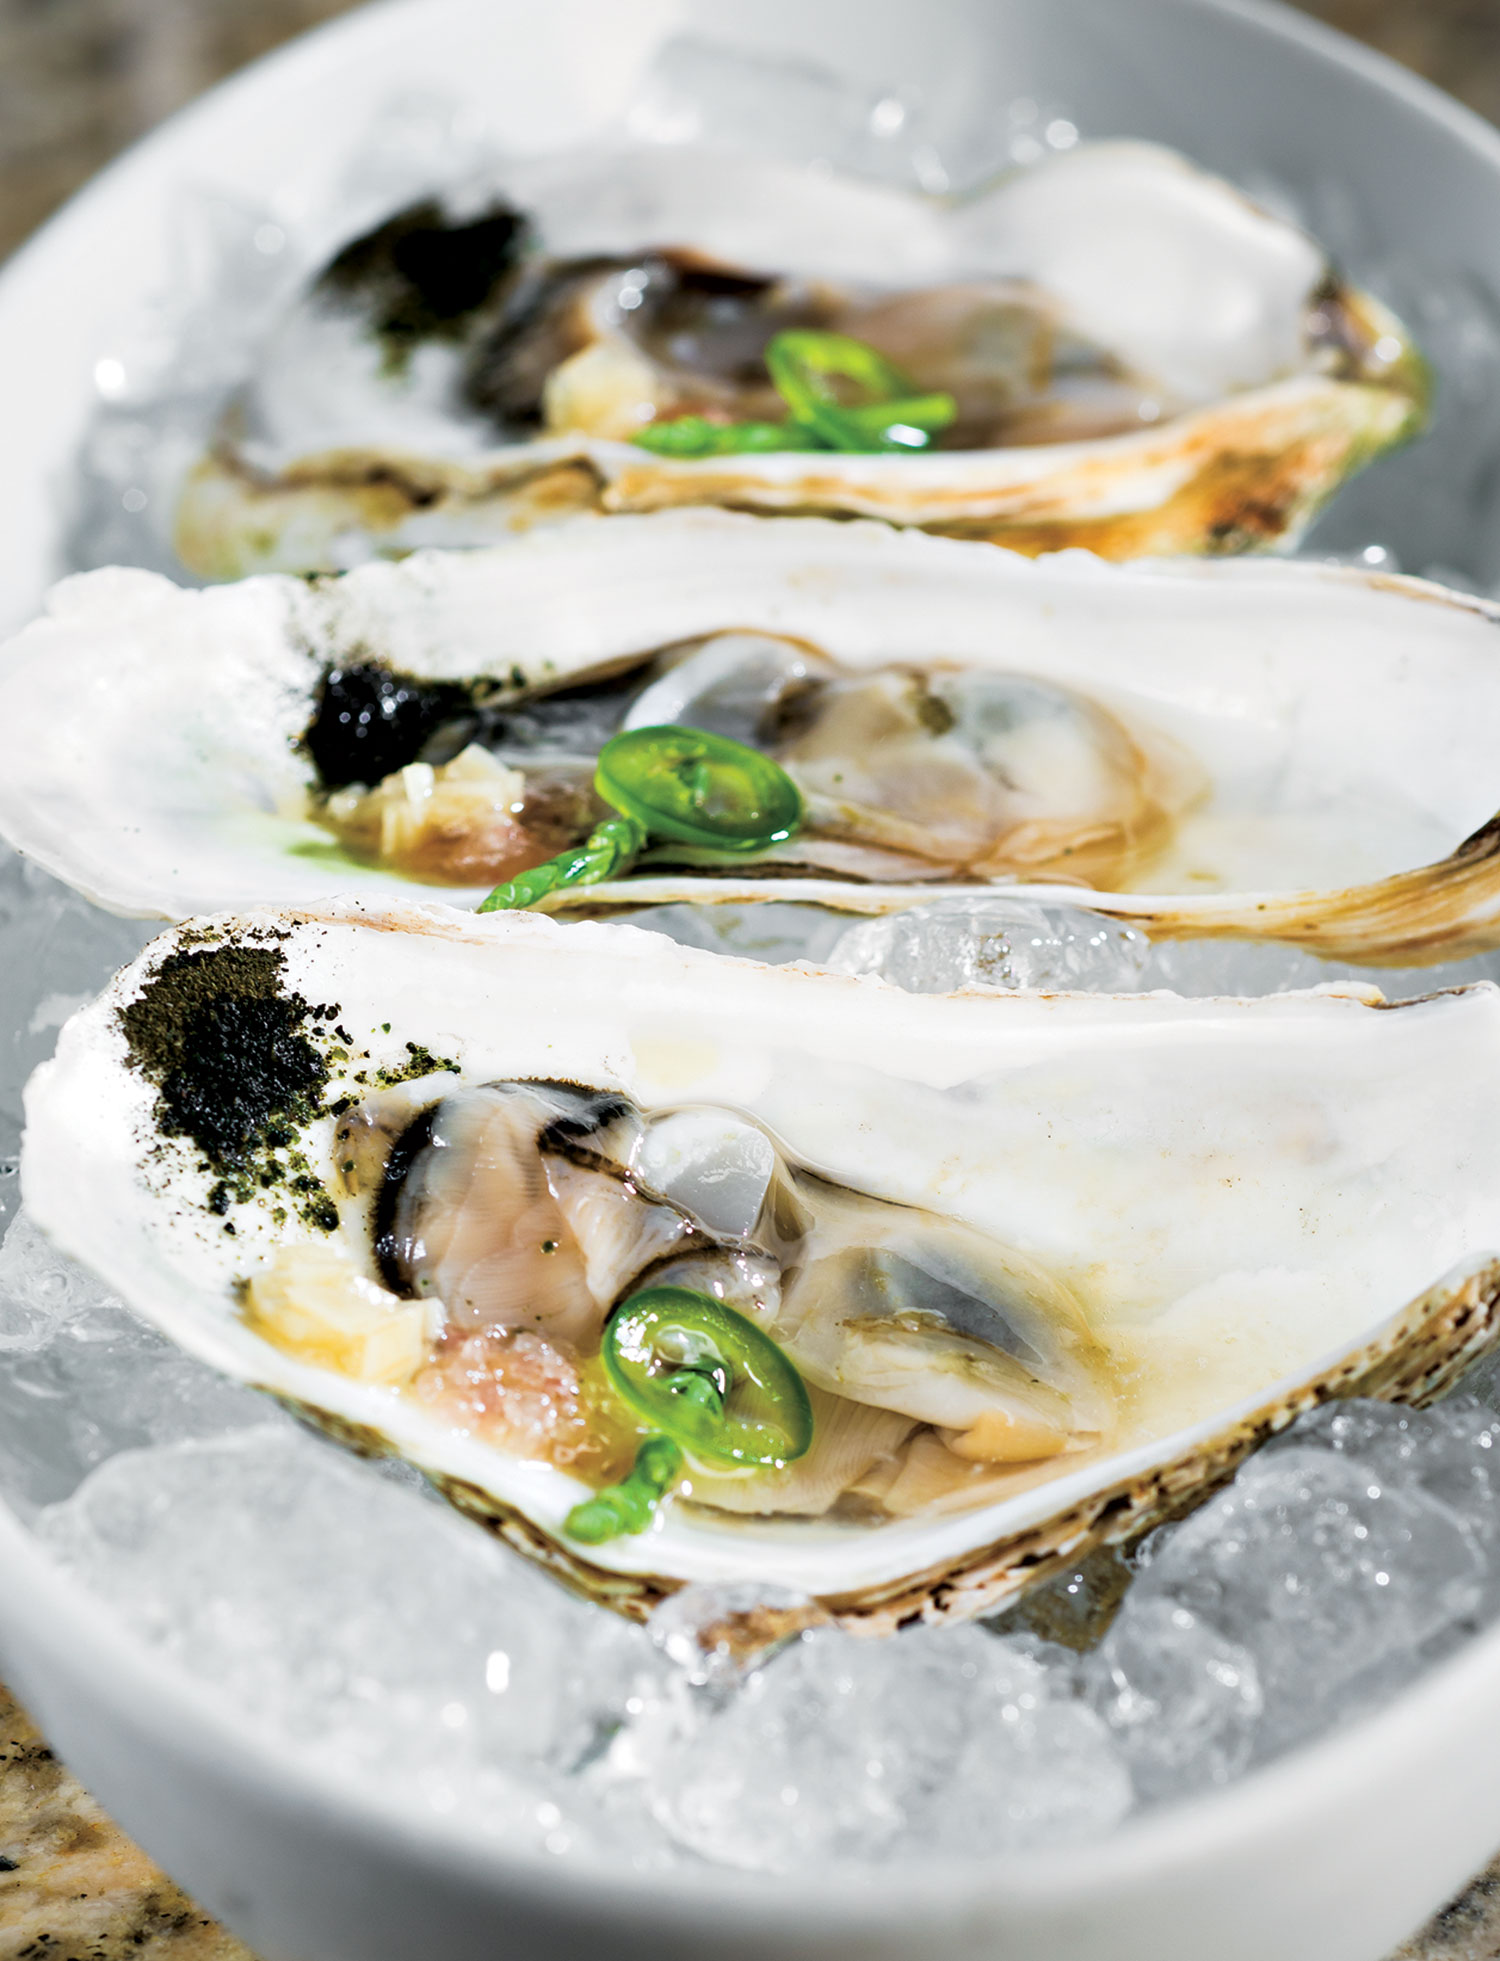 oysters with jalapeño; photo by Rob Ballard